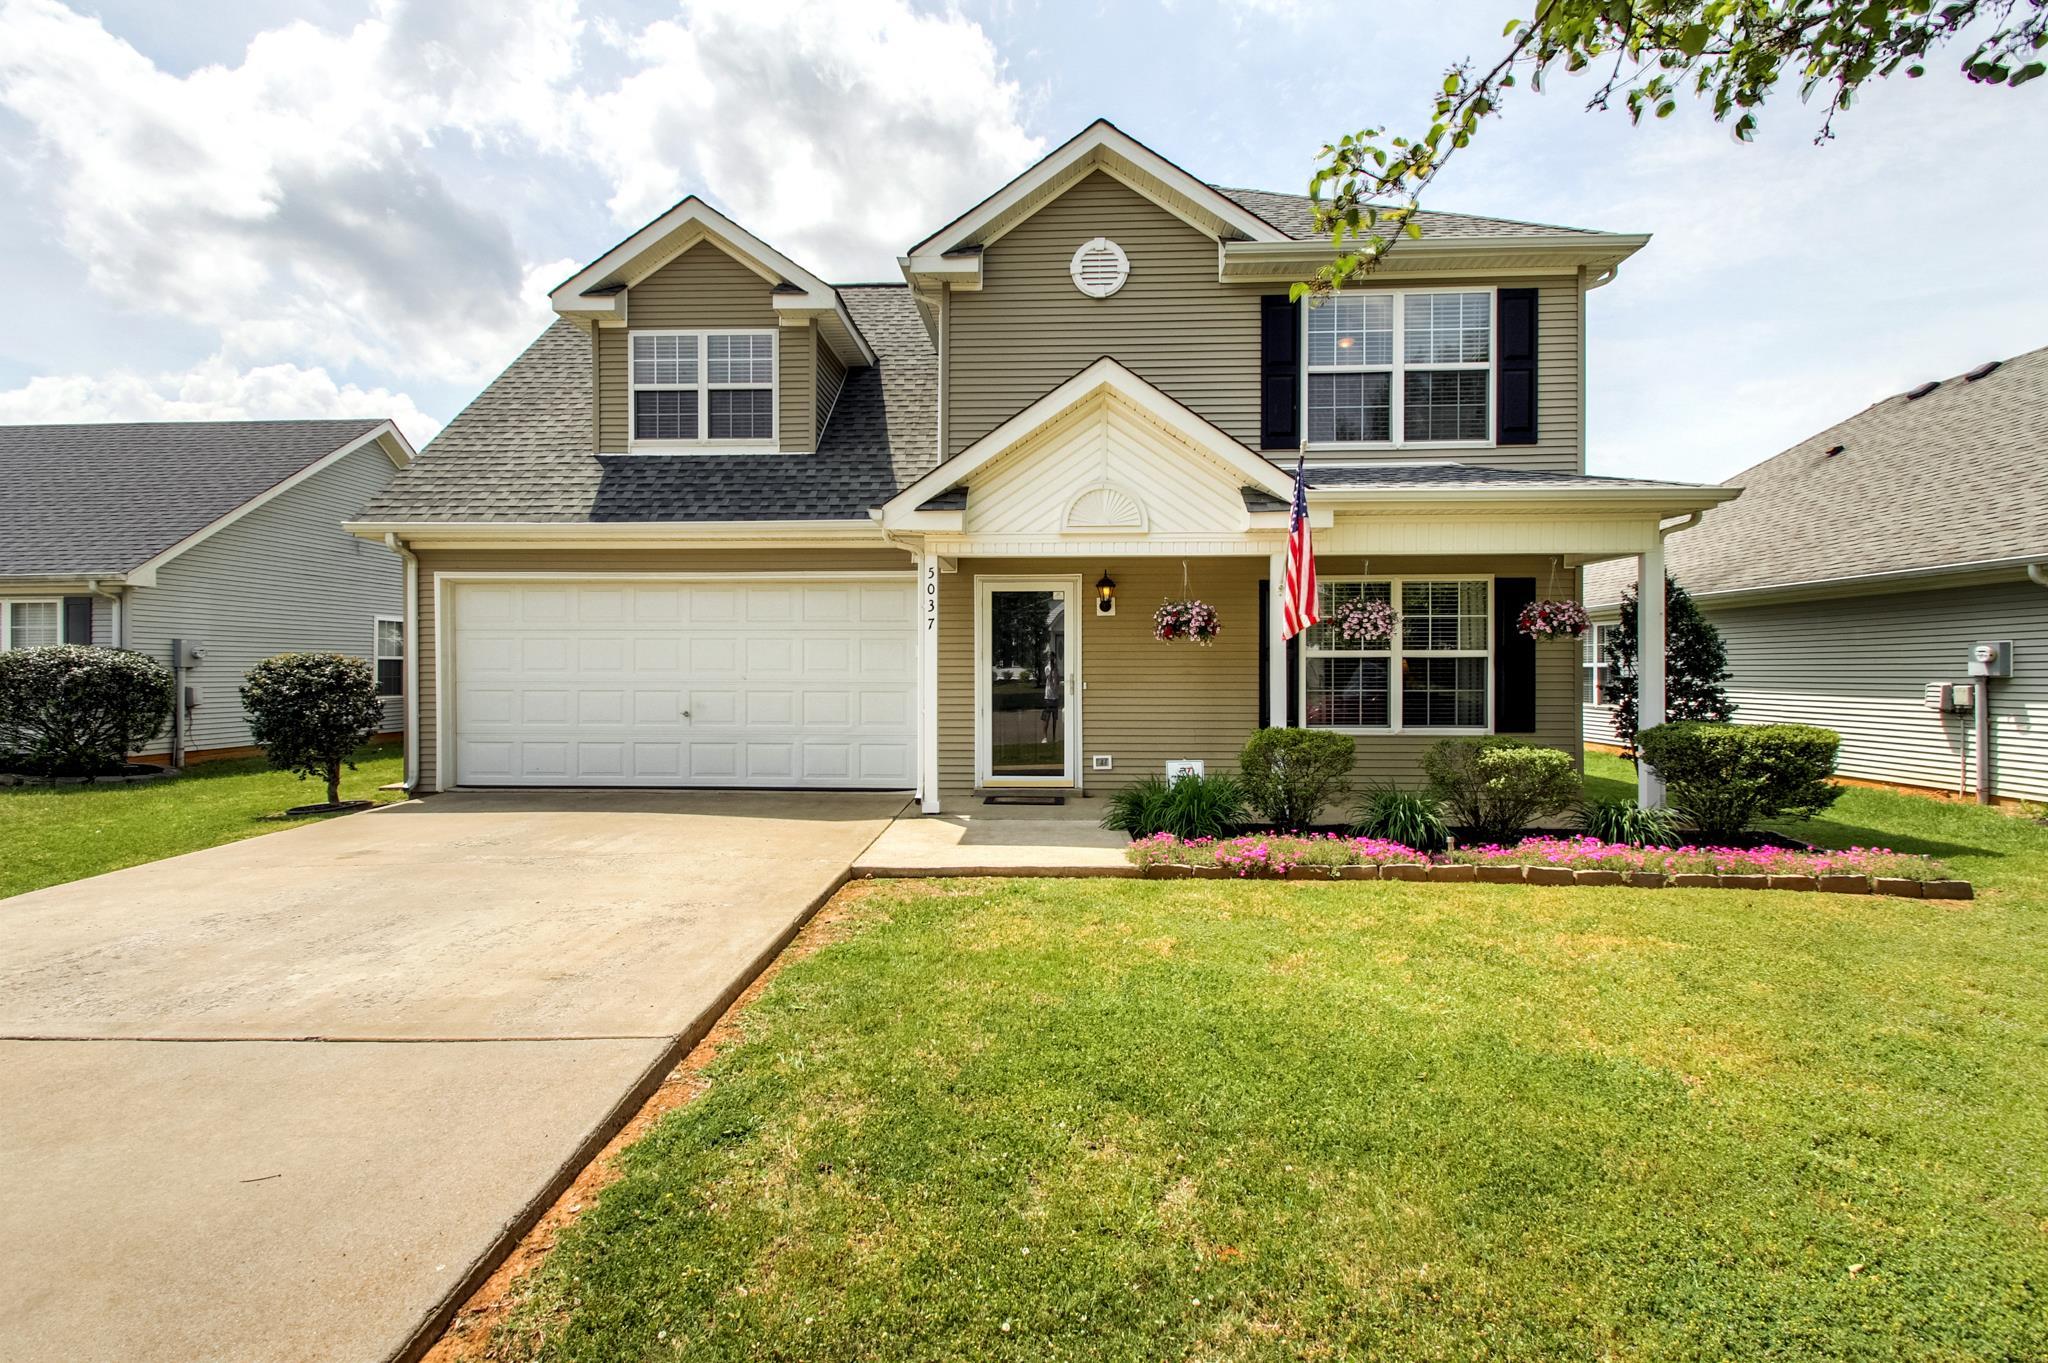 5037 Boyd Dr, Murfreesboro, TN 37129